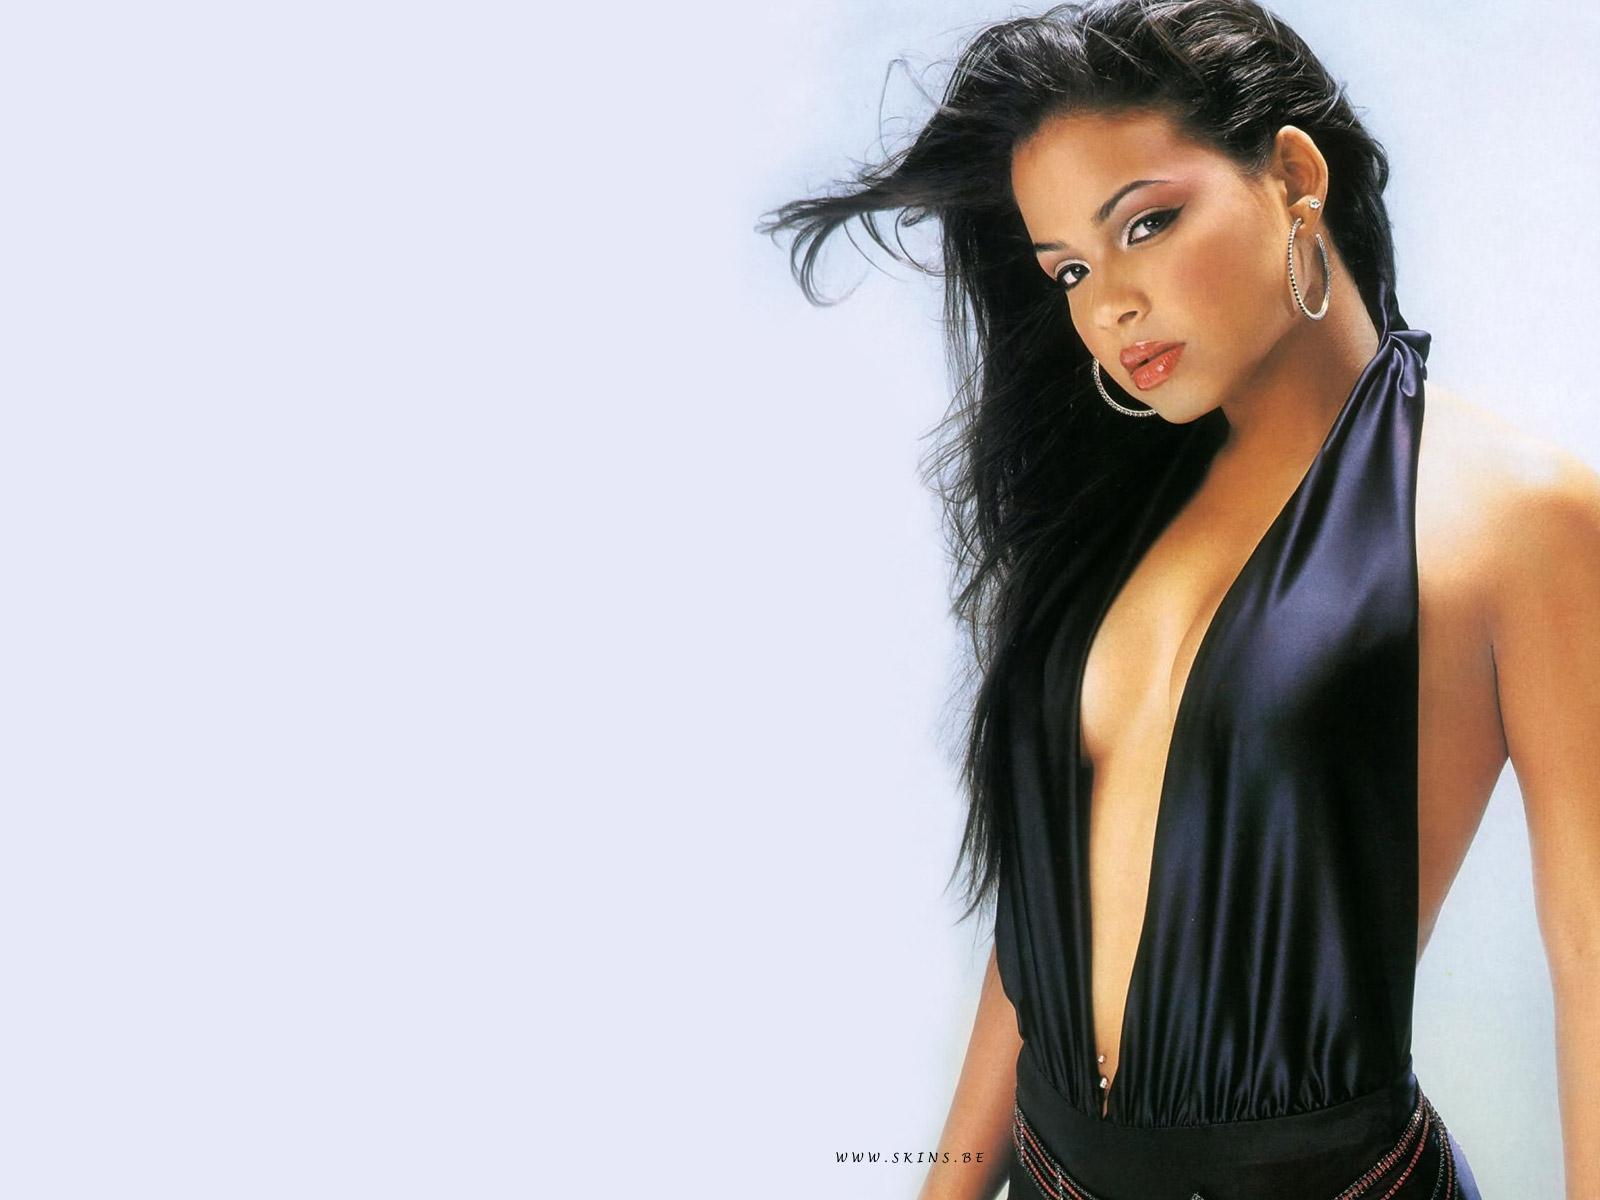 http://4.bp.blogspot.com/_BpAoKRSdVjQ/TOFaJC7I68I/AAAAAAAACys/YAzxaVFK67A/s1600/Christina-Milian-celeb.jpg